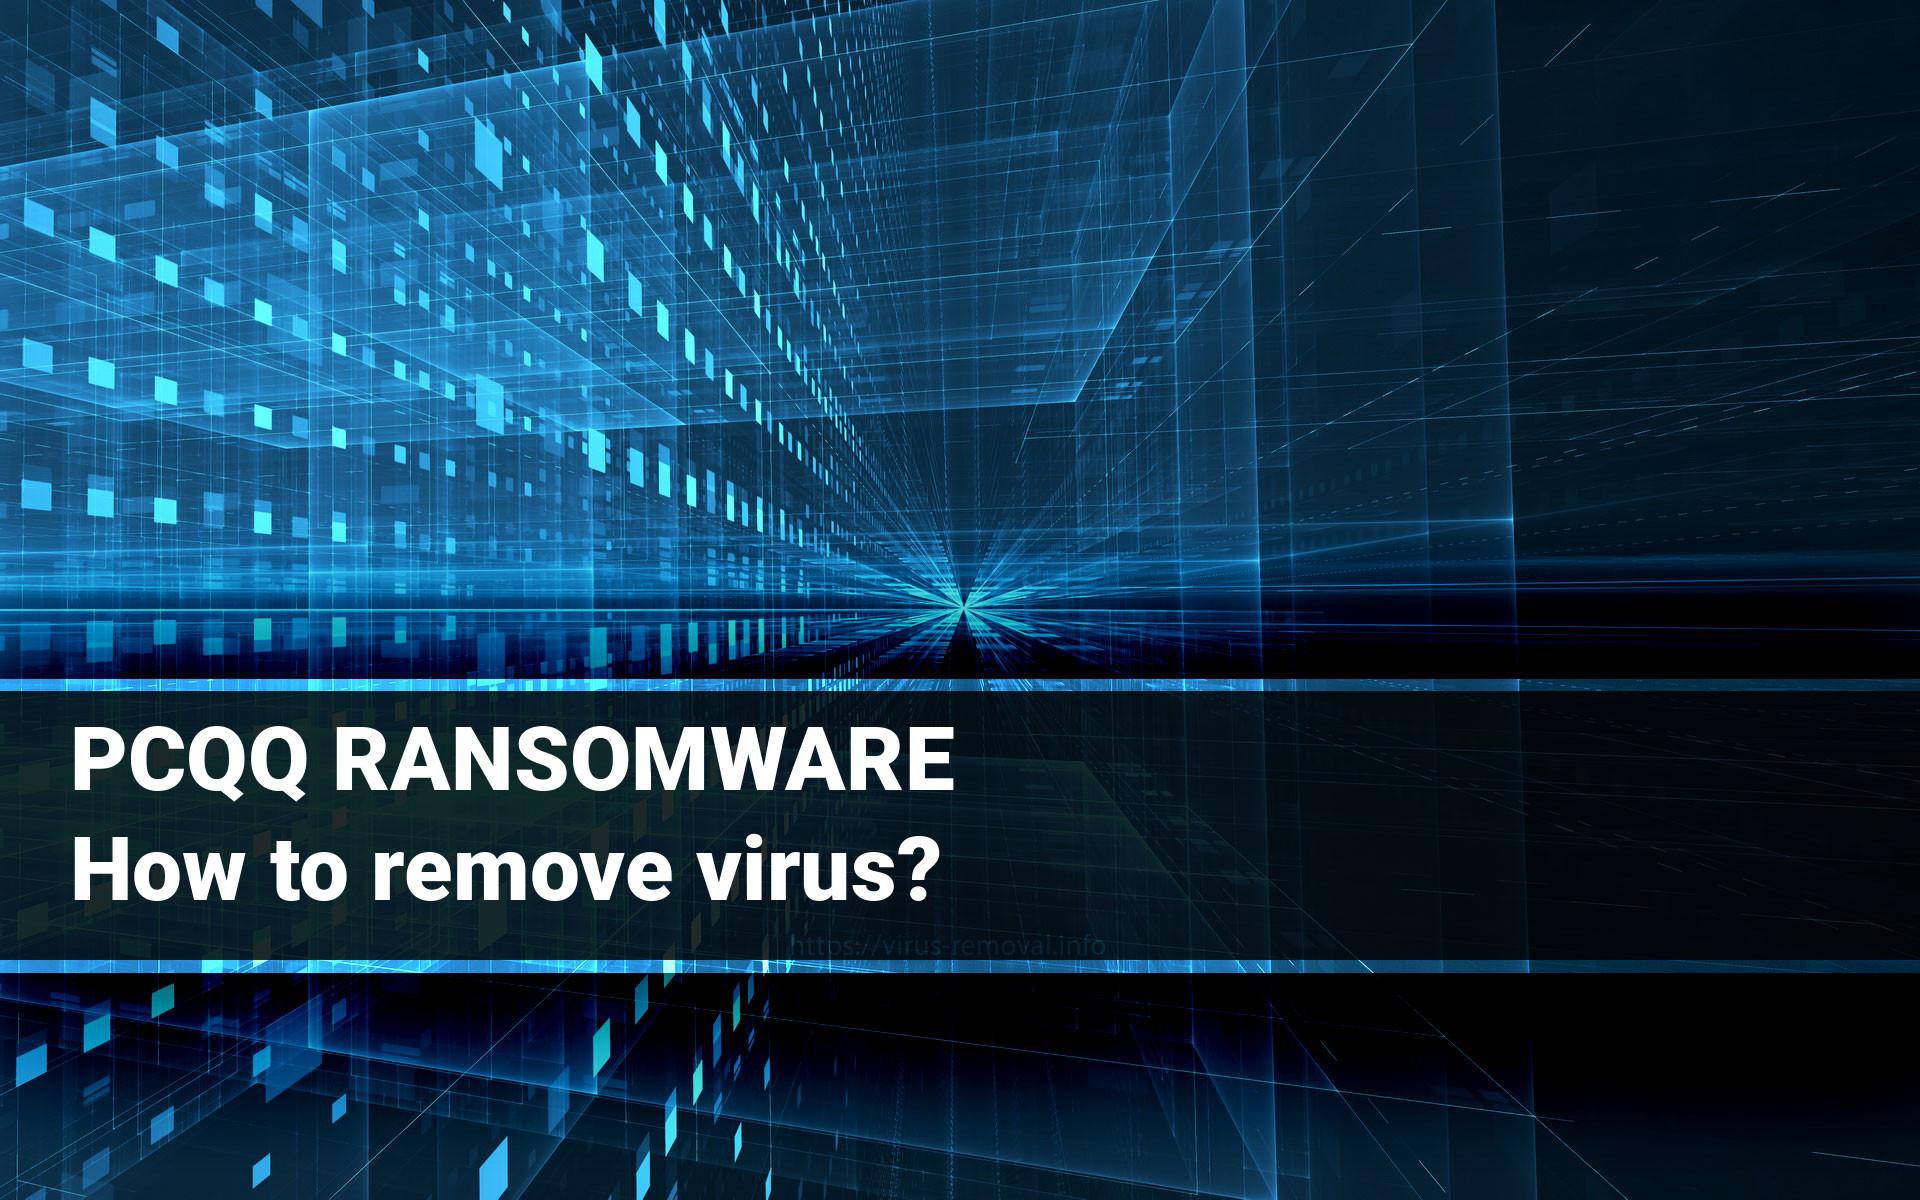 PCQQ Ransomware